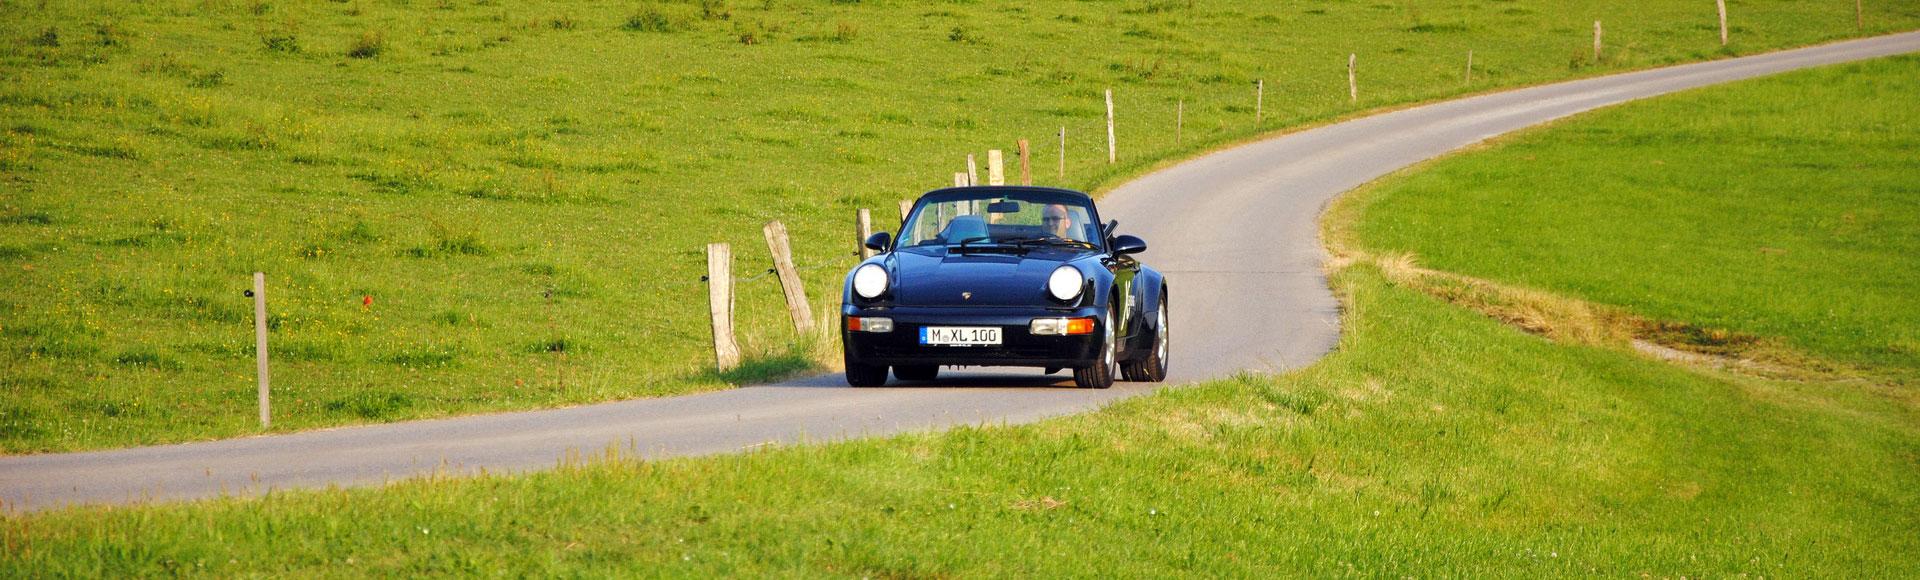 Porsche 964 WTL Cabrio 1992 Sommer 4618